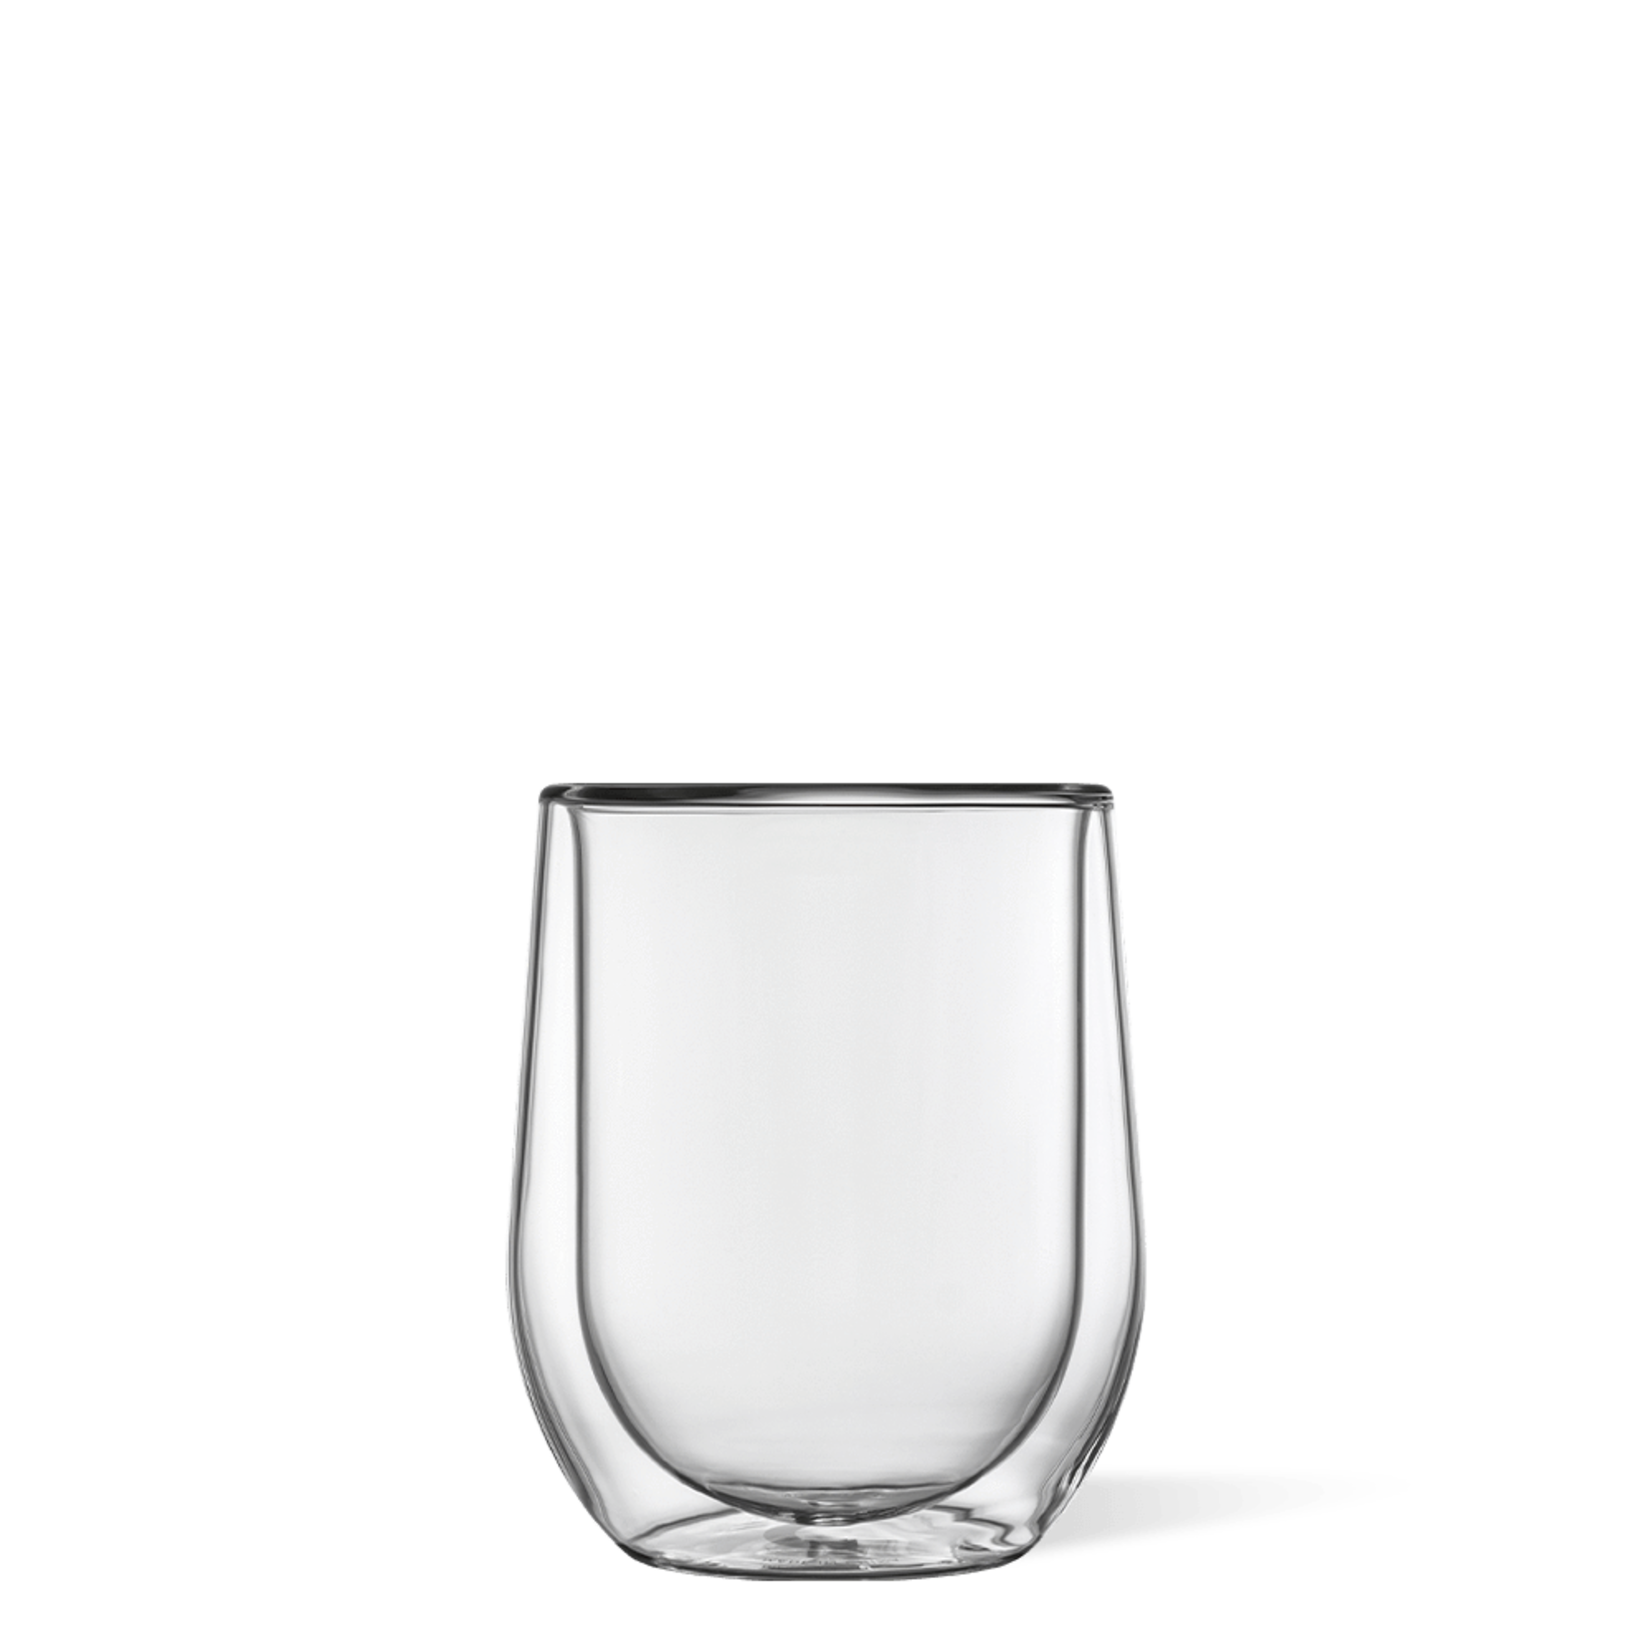 CORKCICLE STEMLESS GLASS SET - 2 PACK